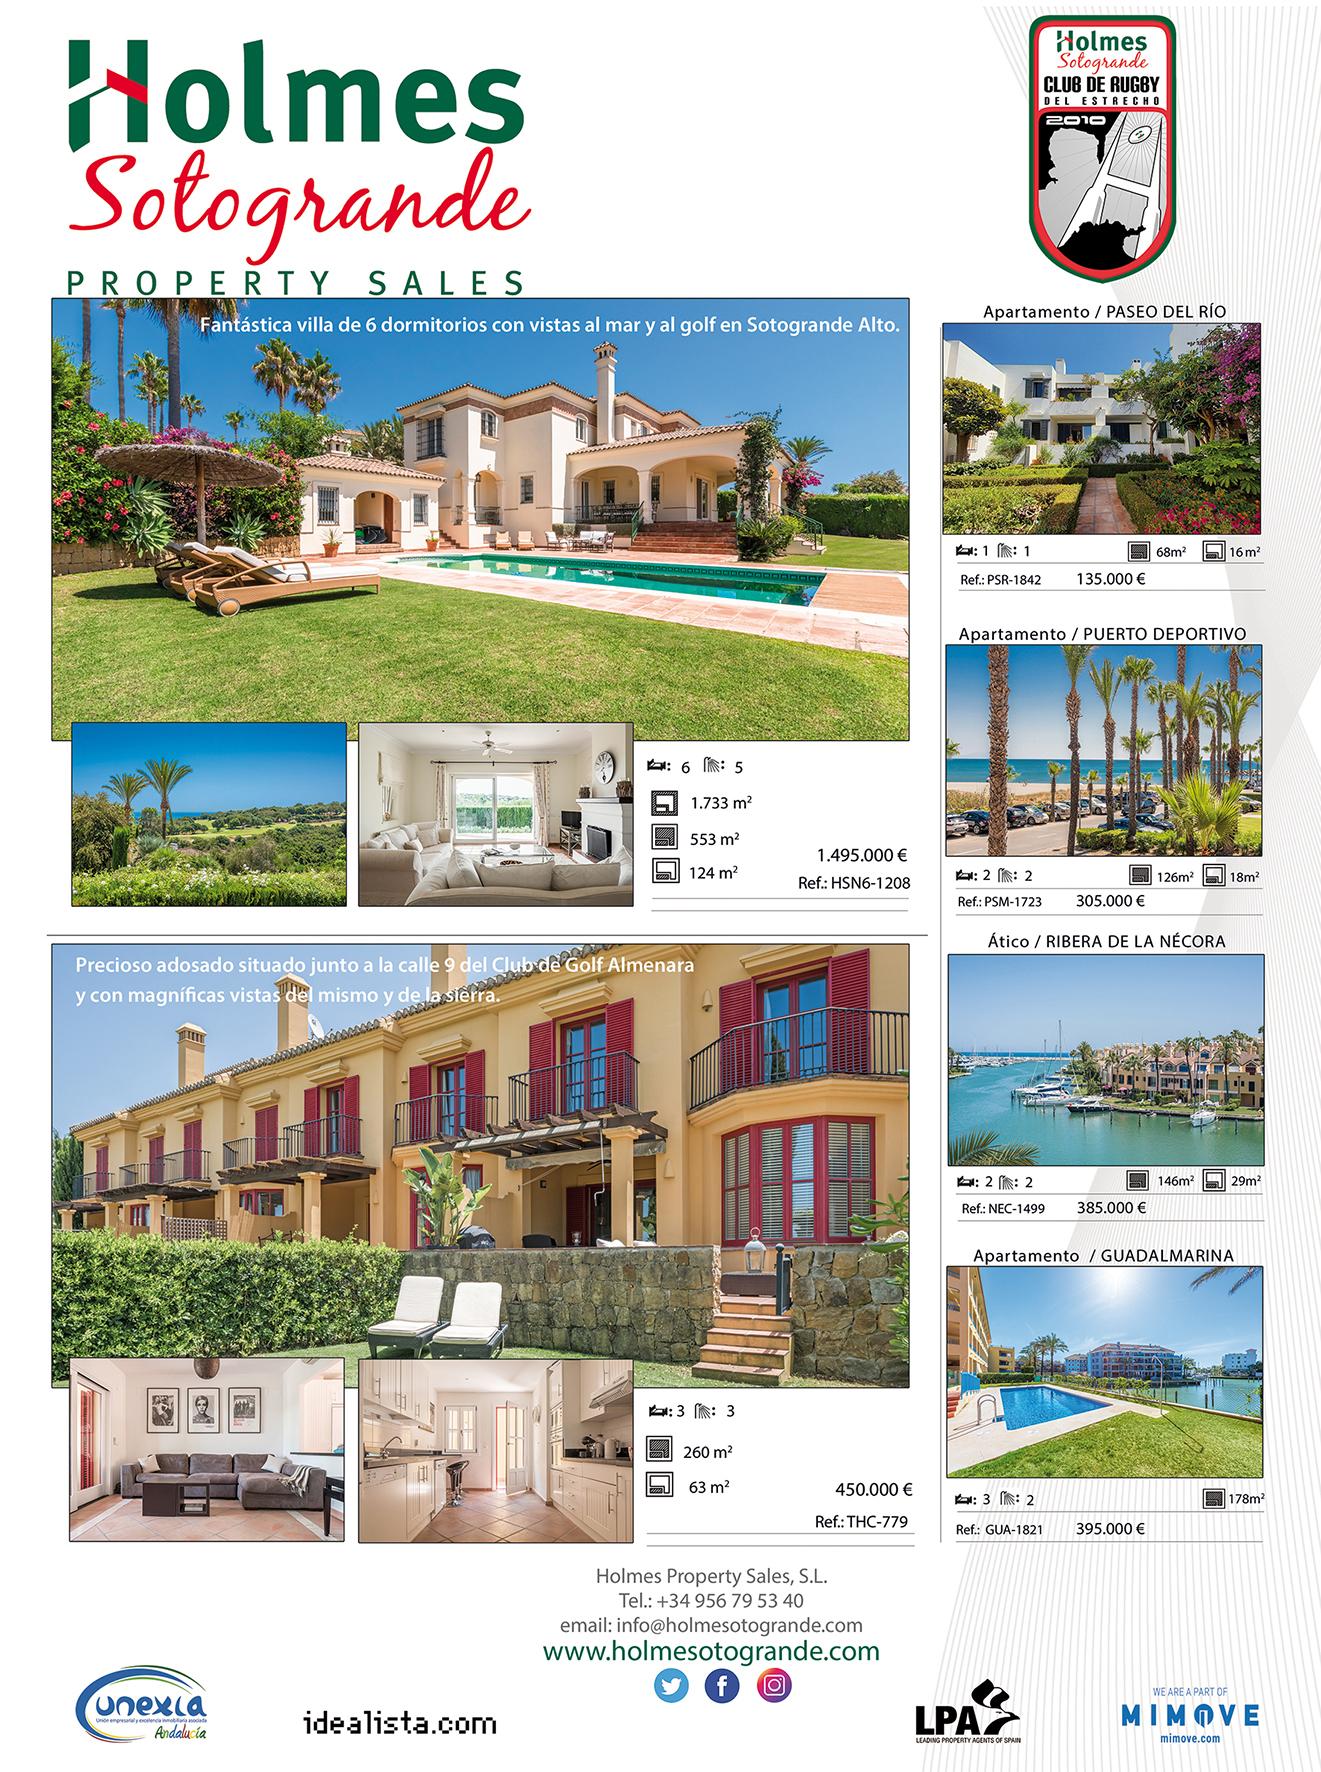 advert six wonderful properties in Sotogrande for sale